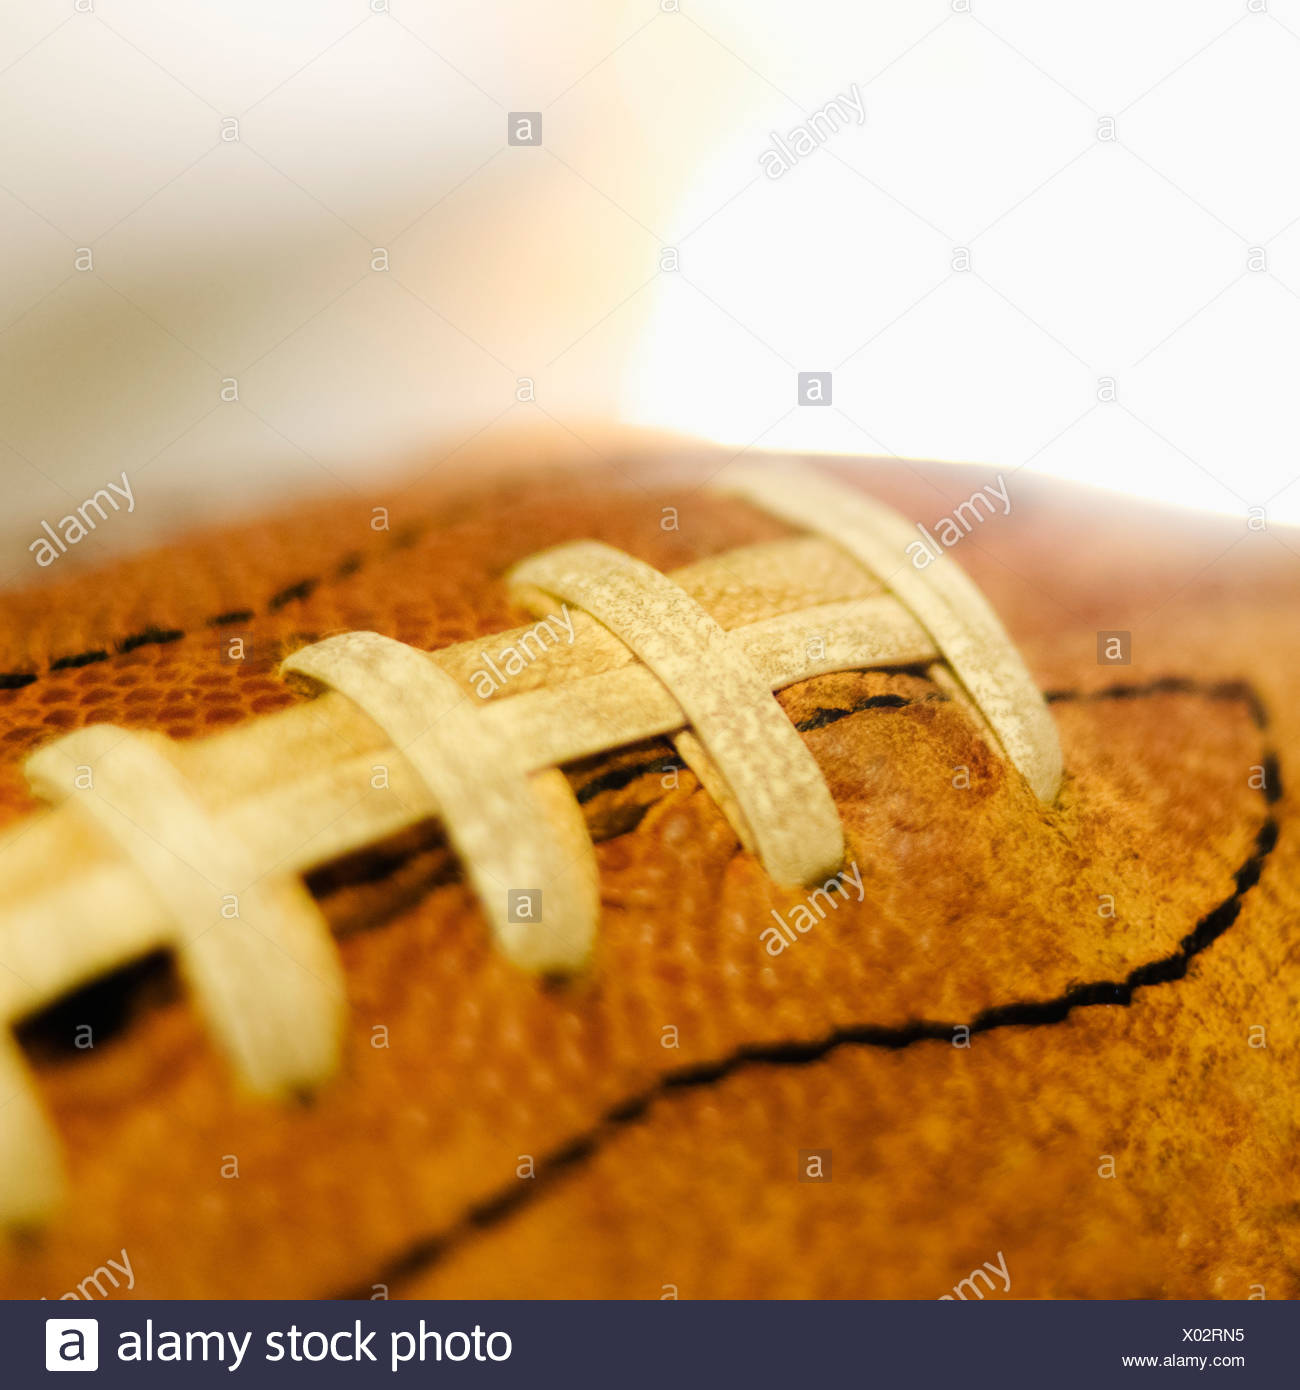 Studio shot of old football - Stock Image